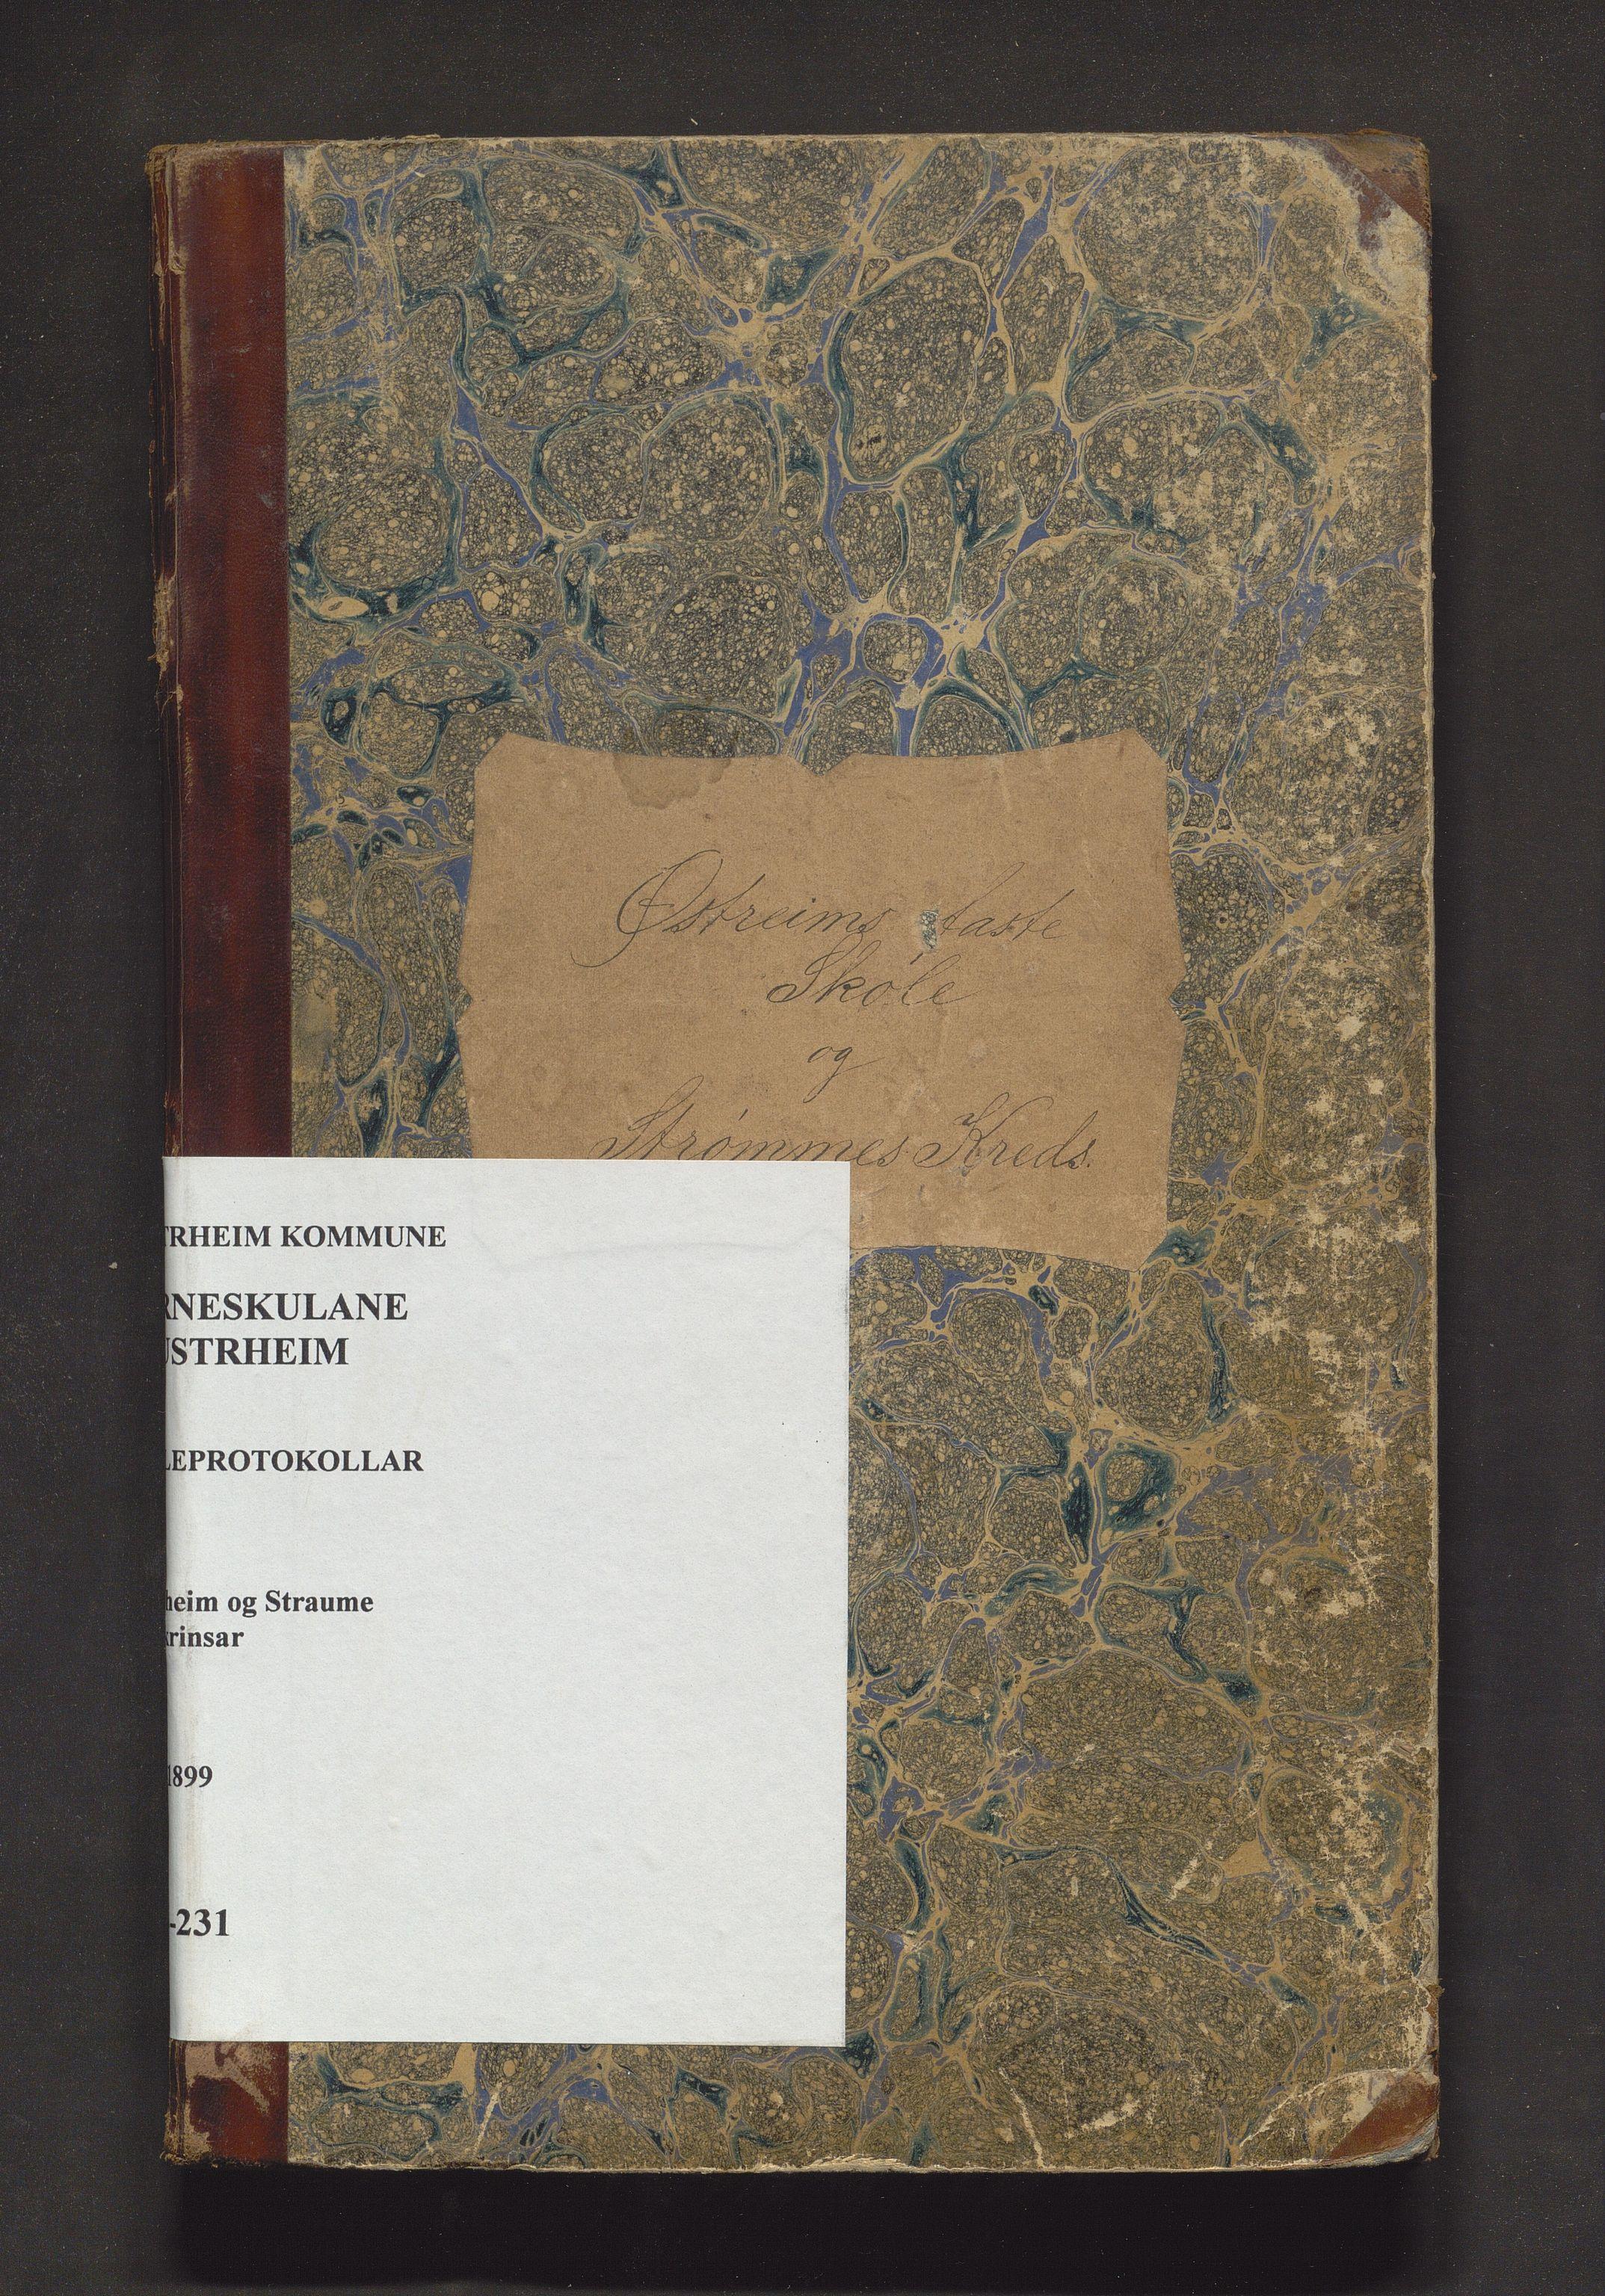 IKAH, Austrheim kommune. Barneskulane, F/Fa/L0004: Skuleprotokoll for Austrheim og Straume, 1888-1899